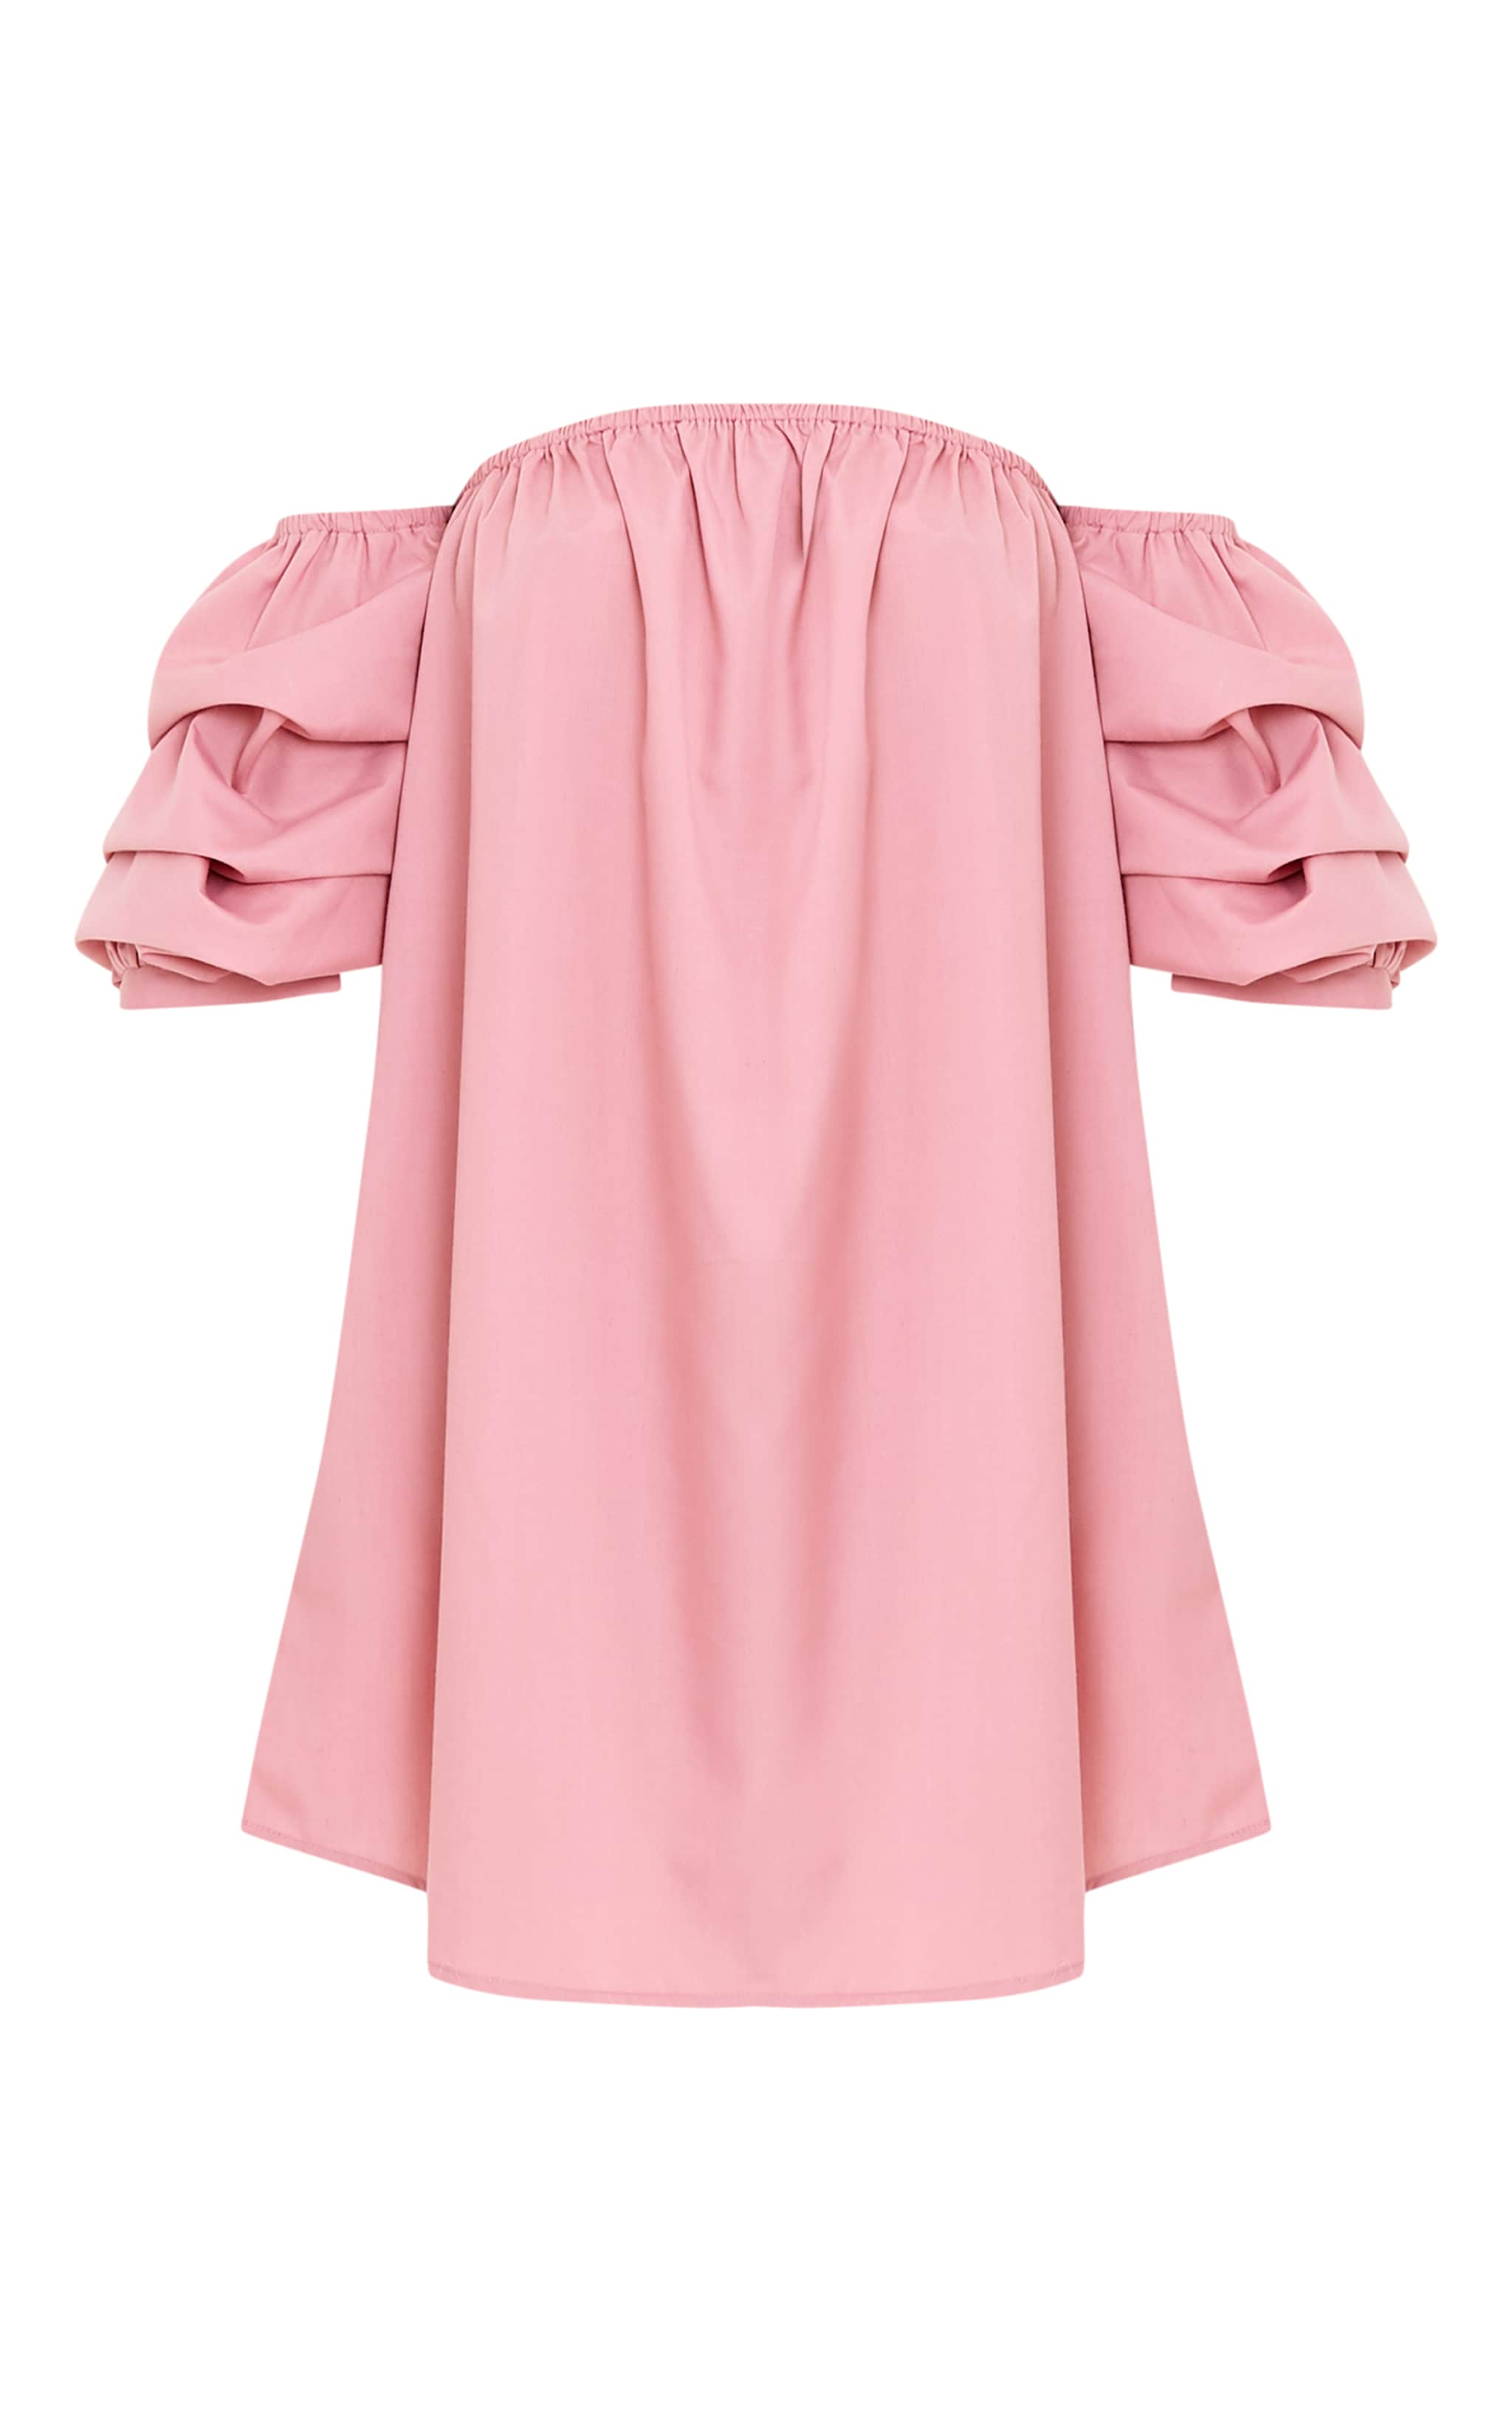 Lucinndar Cotton Ruched Bardot Sleeve Shift Dress Pink 3